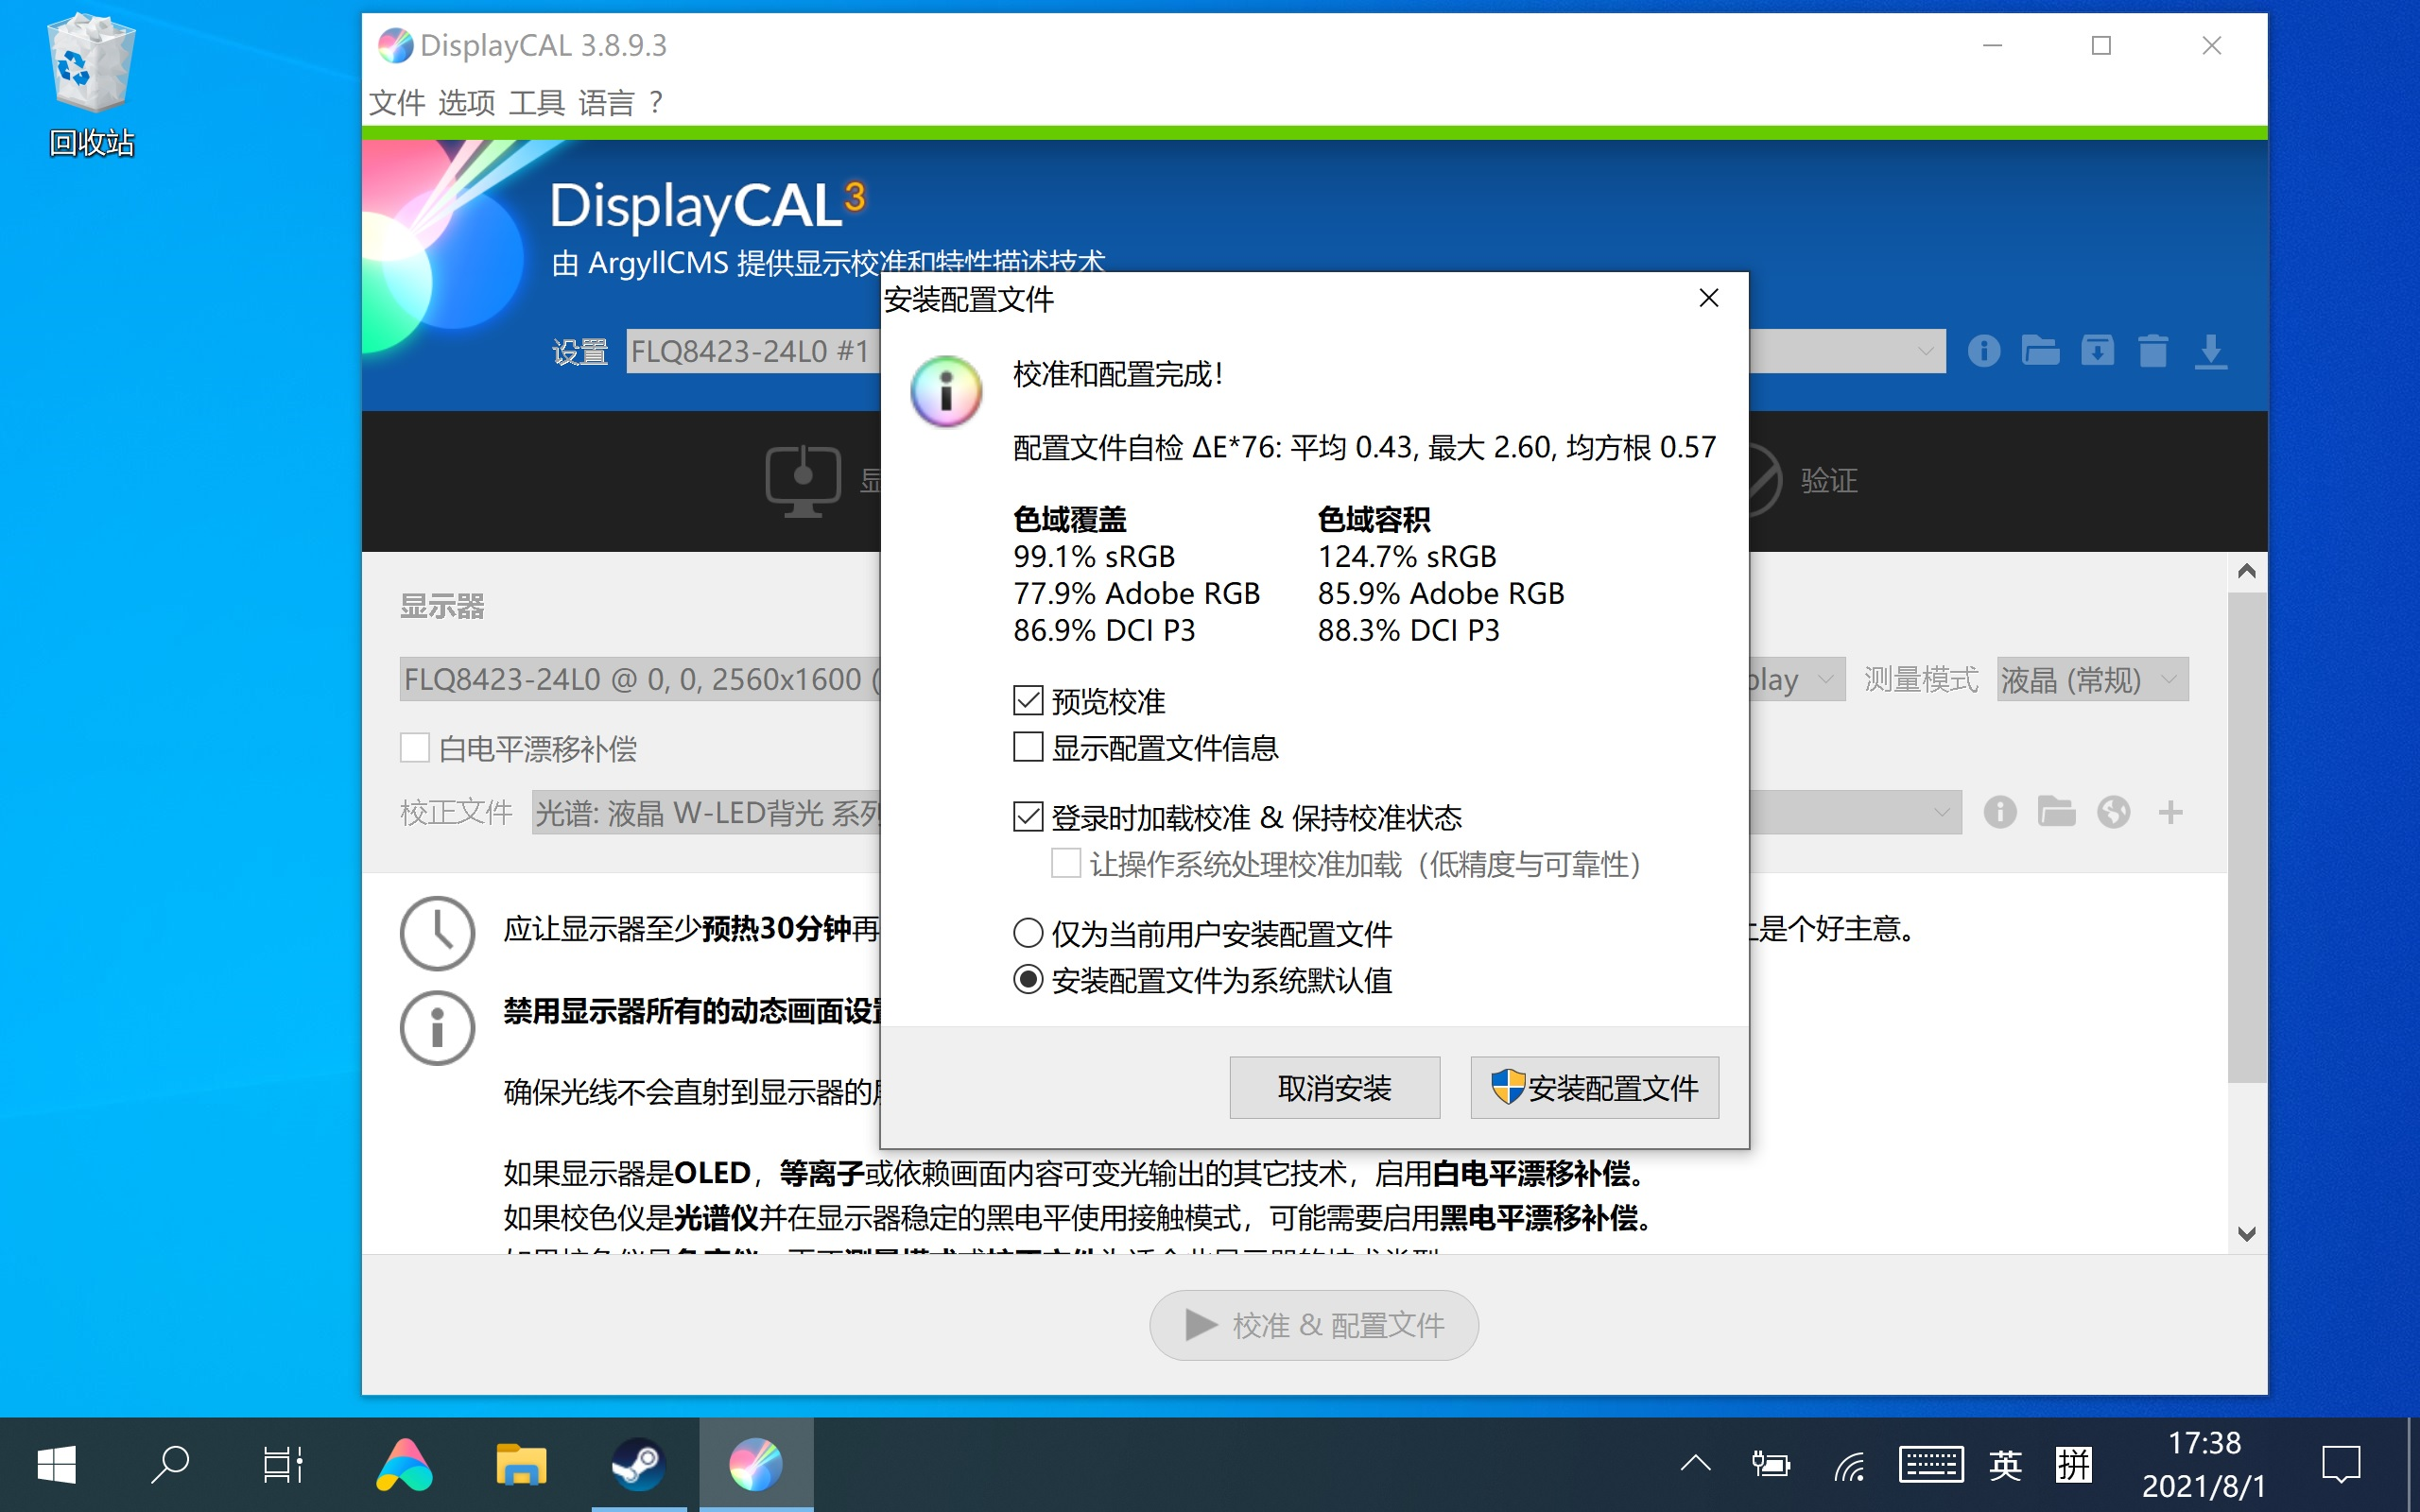 《OneXPlayer掌机DisplayCAL校色文件》